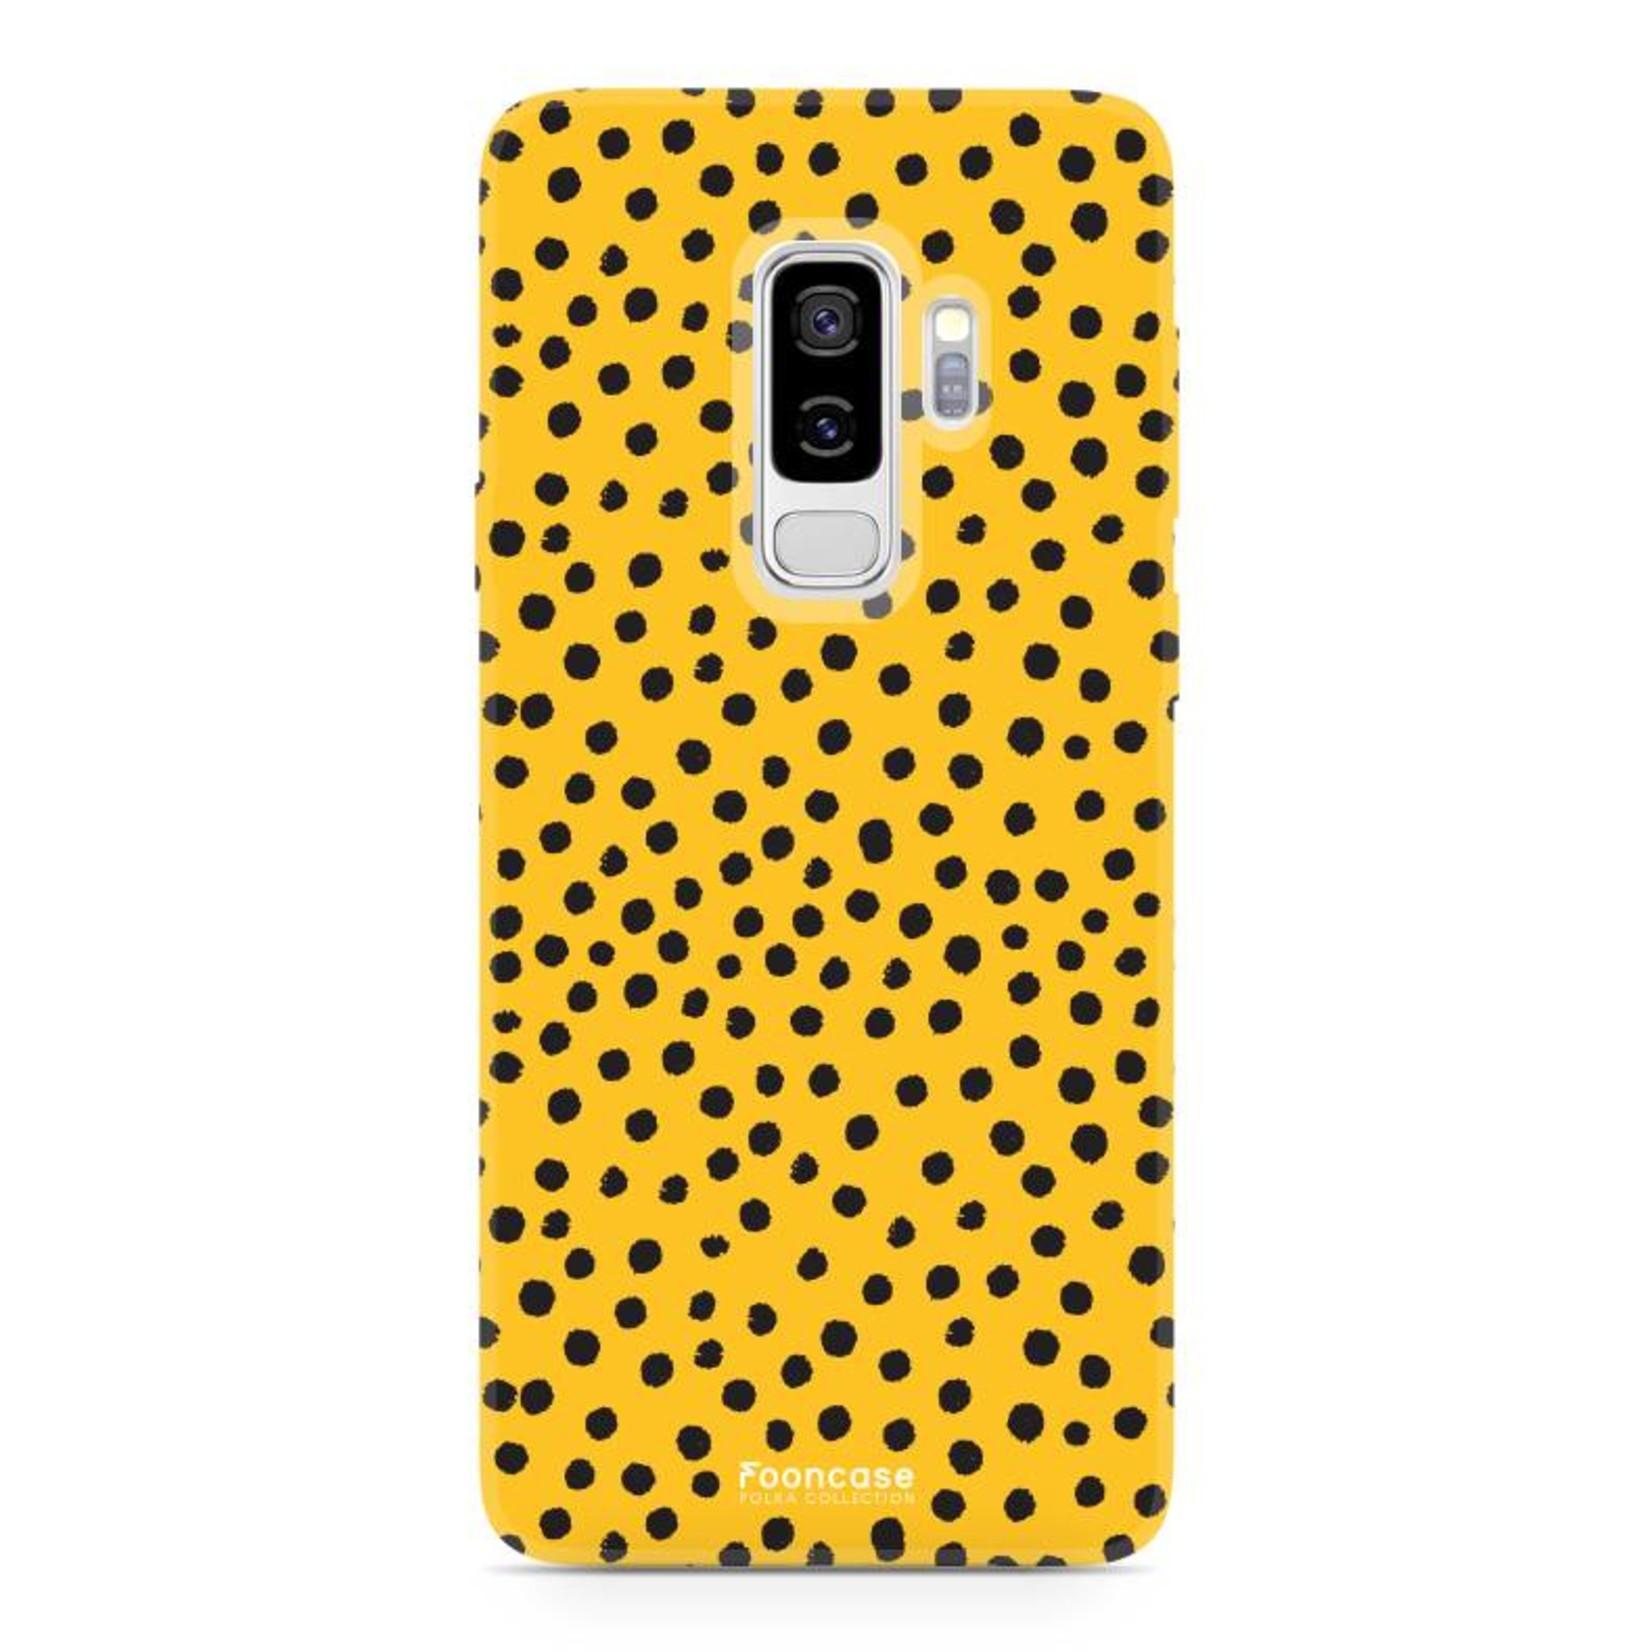 FOONCASE Samsung Galaxy S9 Plus hoesje TPU Soft Case - Back Cover - POLKA COLLECTION / Stipjes / Stippen / Oker Geel